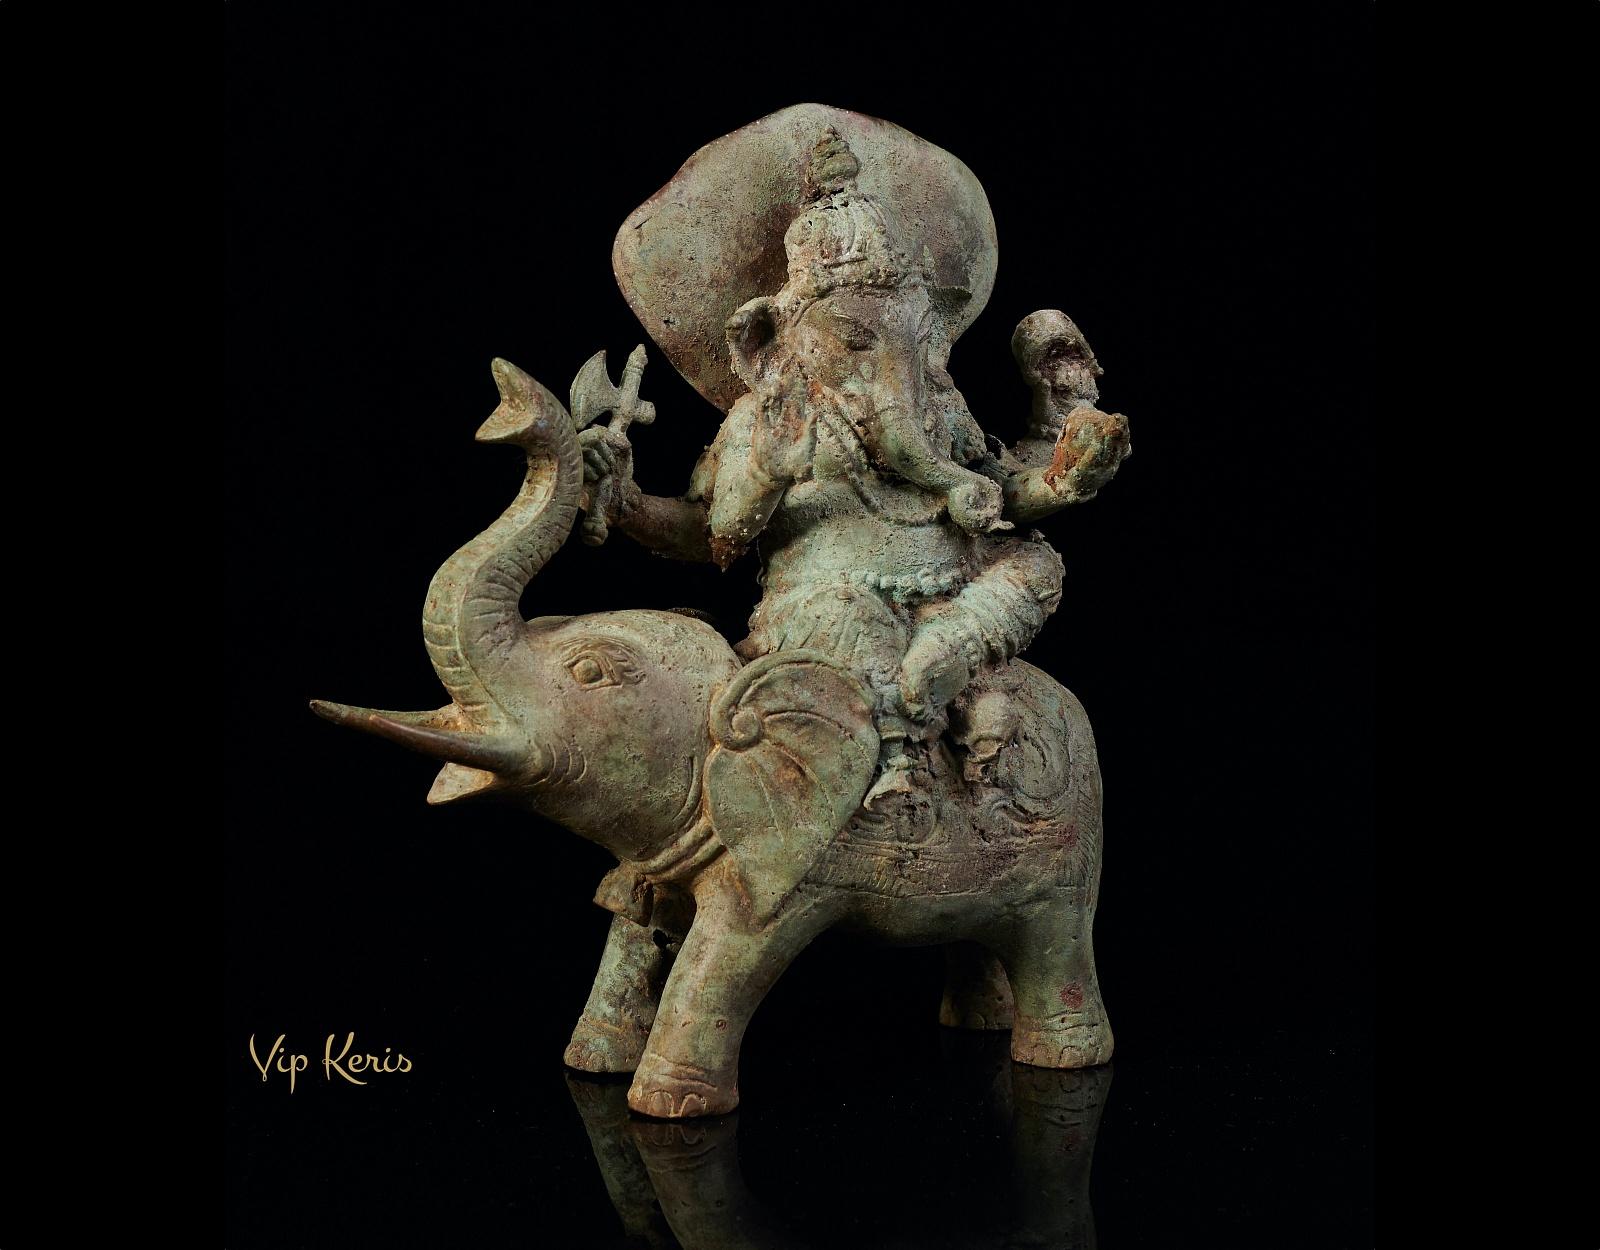 Антикварная статуя Ганеша верхом на слоне фото VipKeris